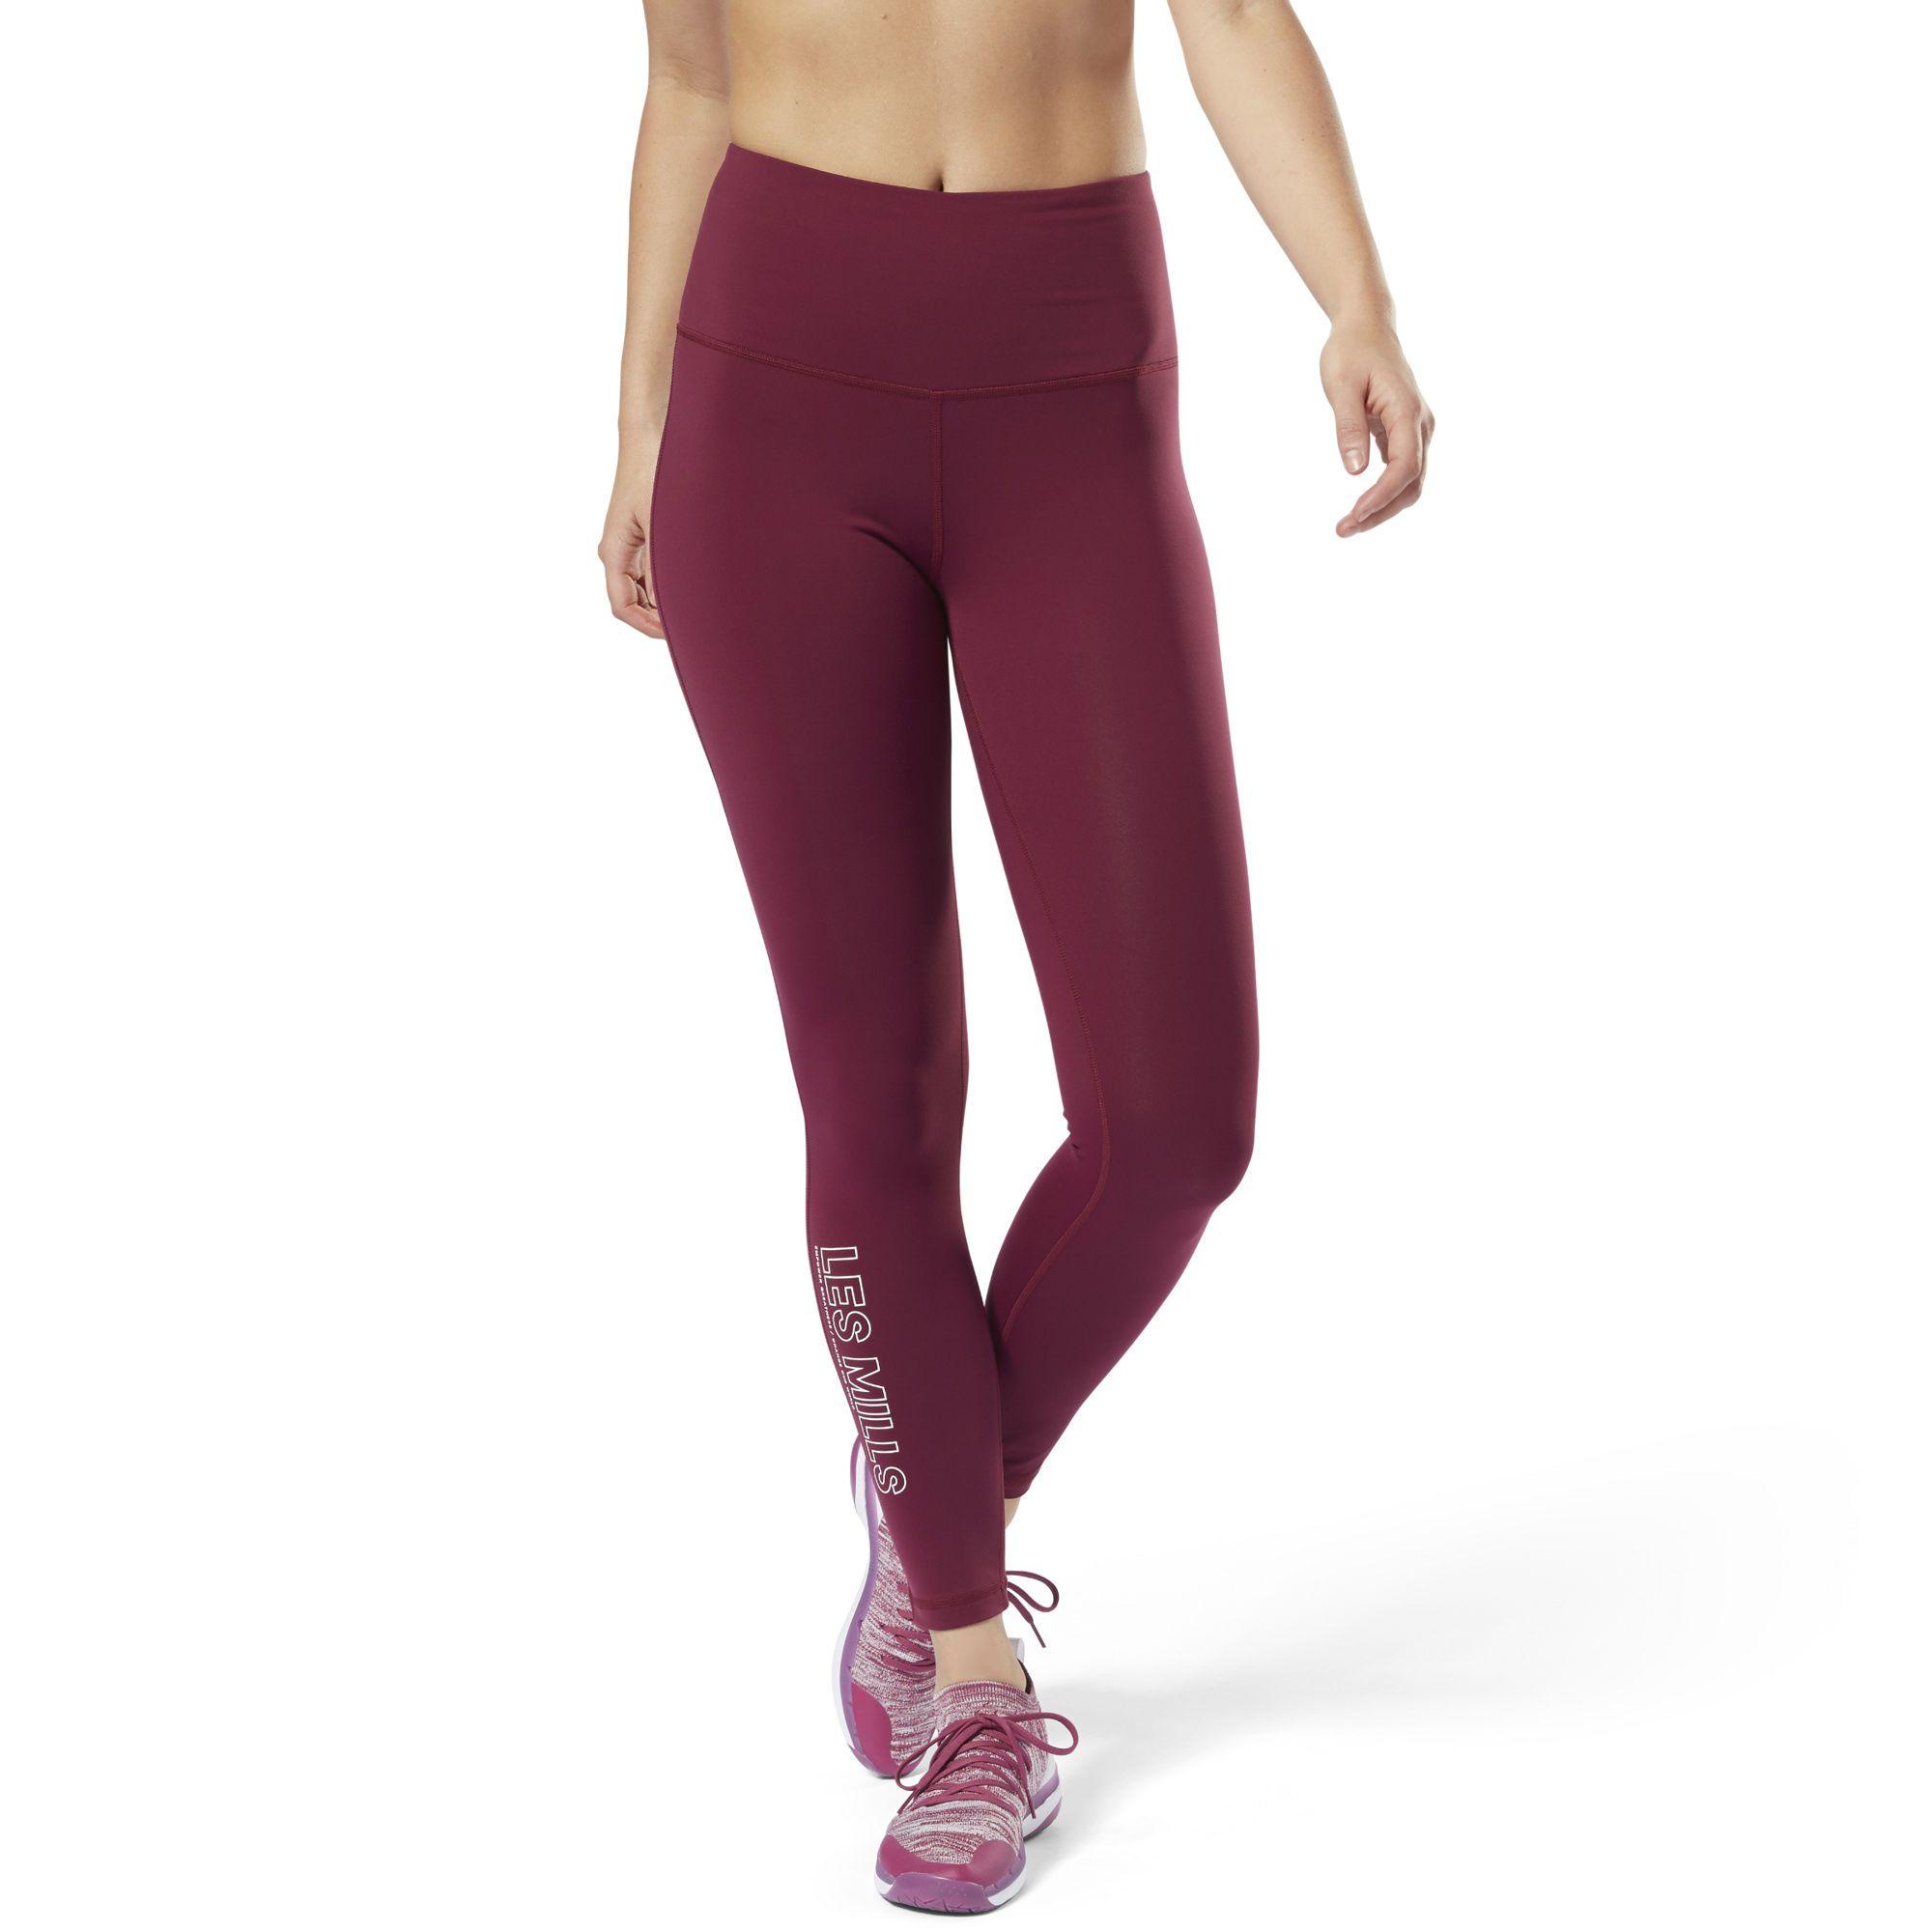 reebok tight fit leggings